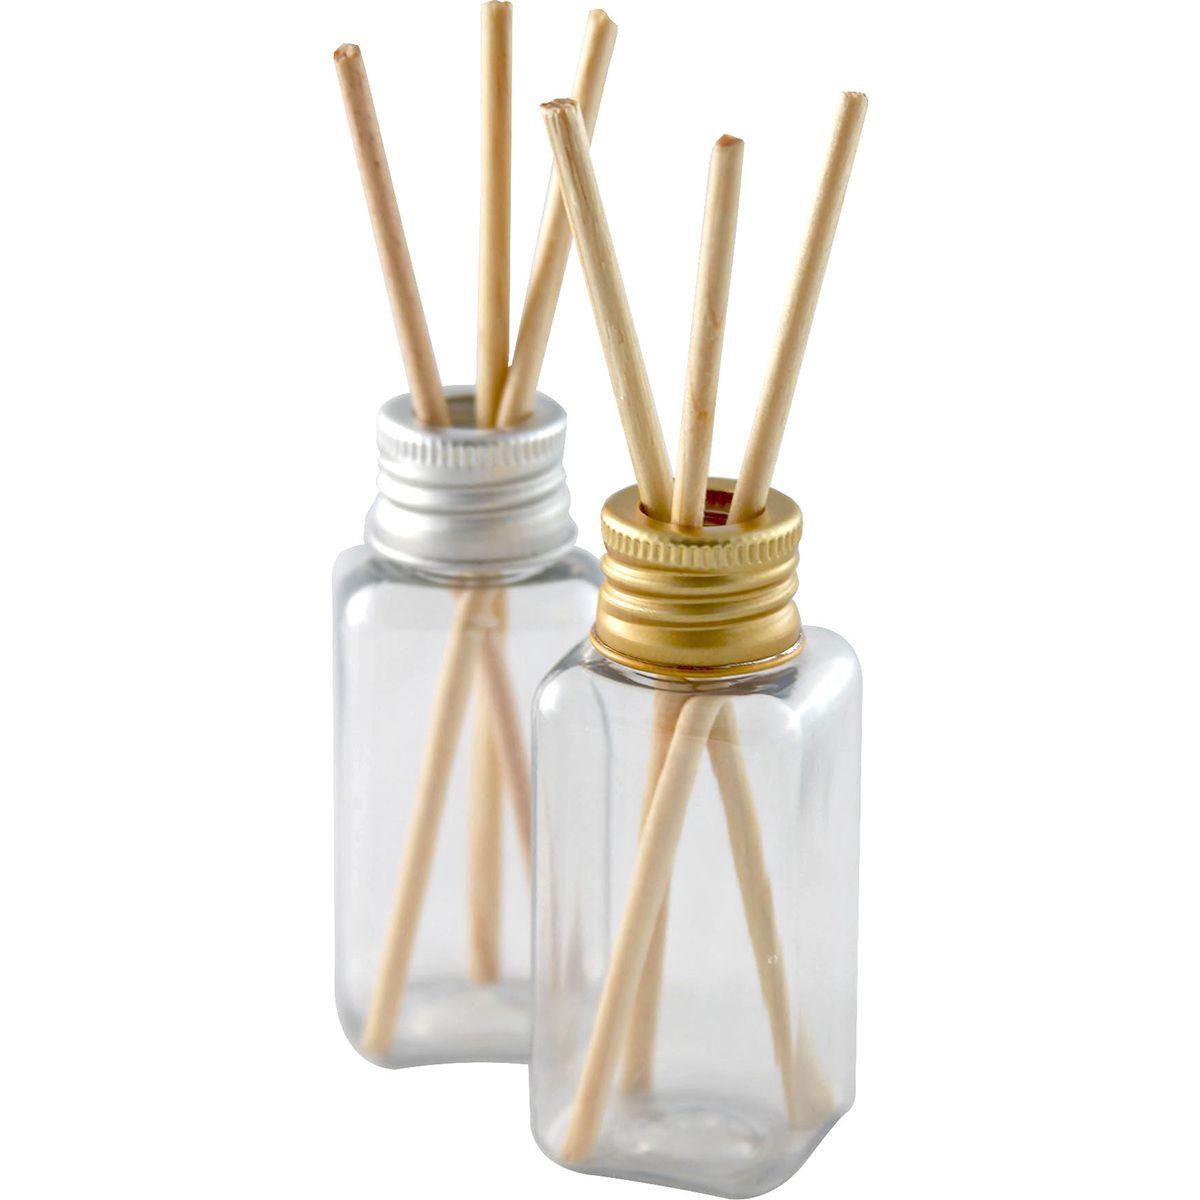 Frasco para Aromatizador Atacado Plástico de 40 ml kit com 200 unidades